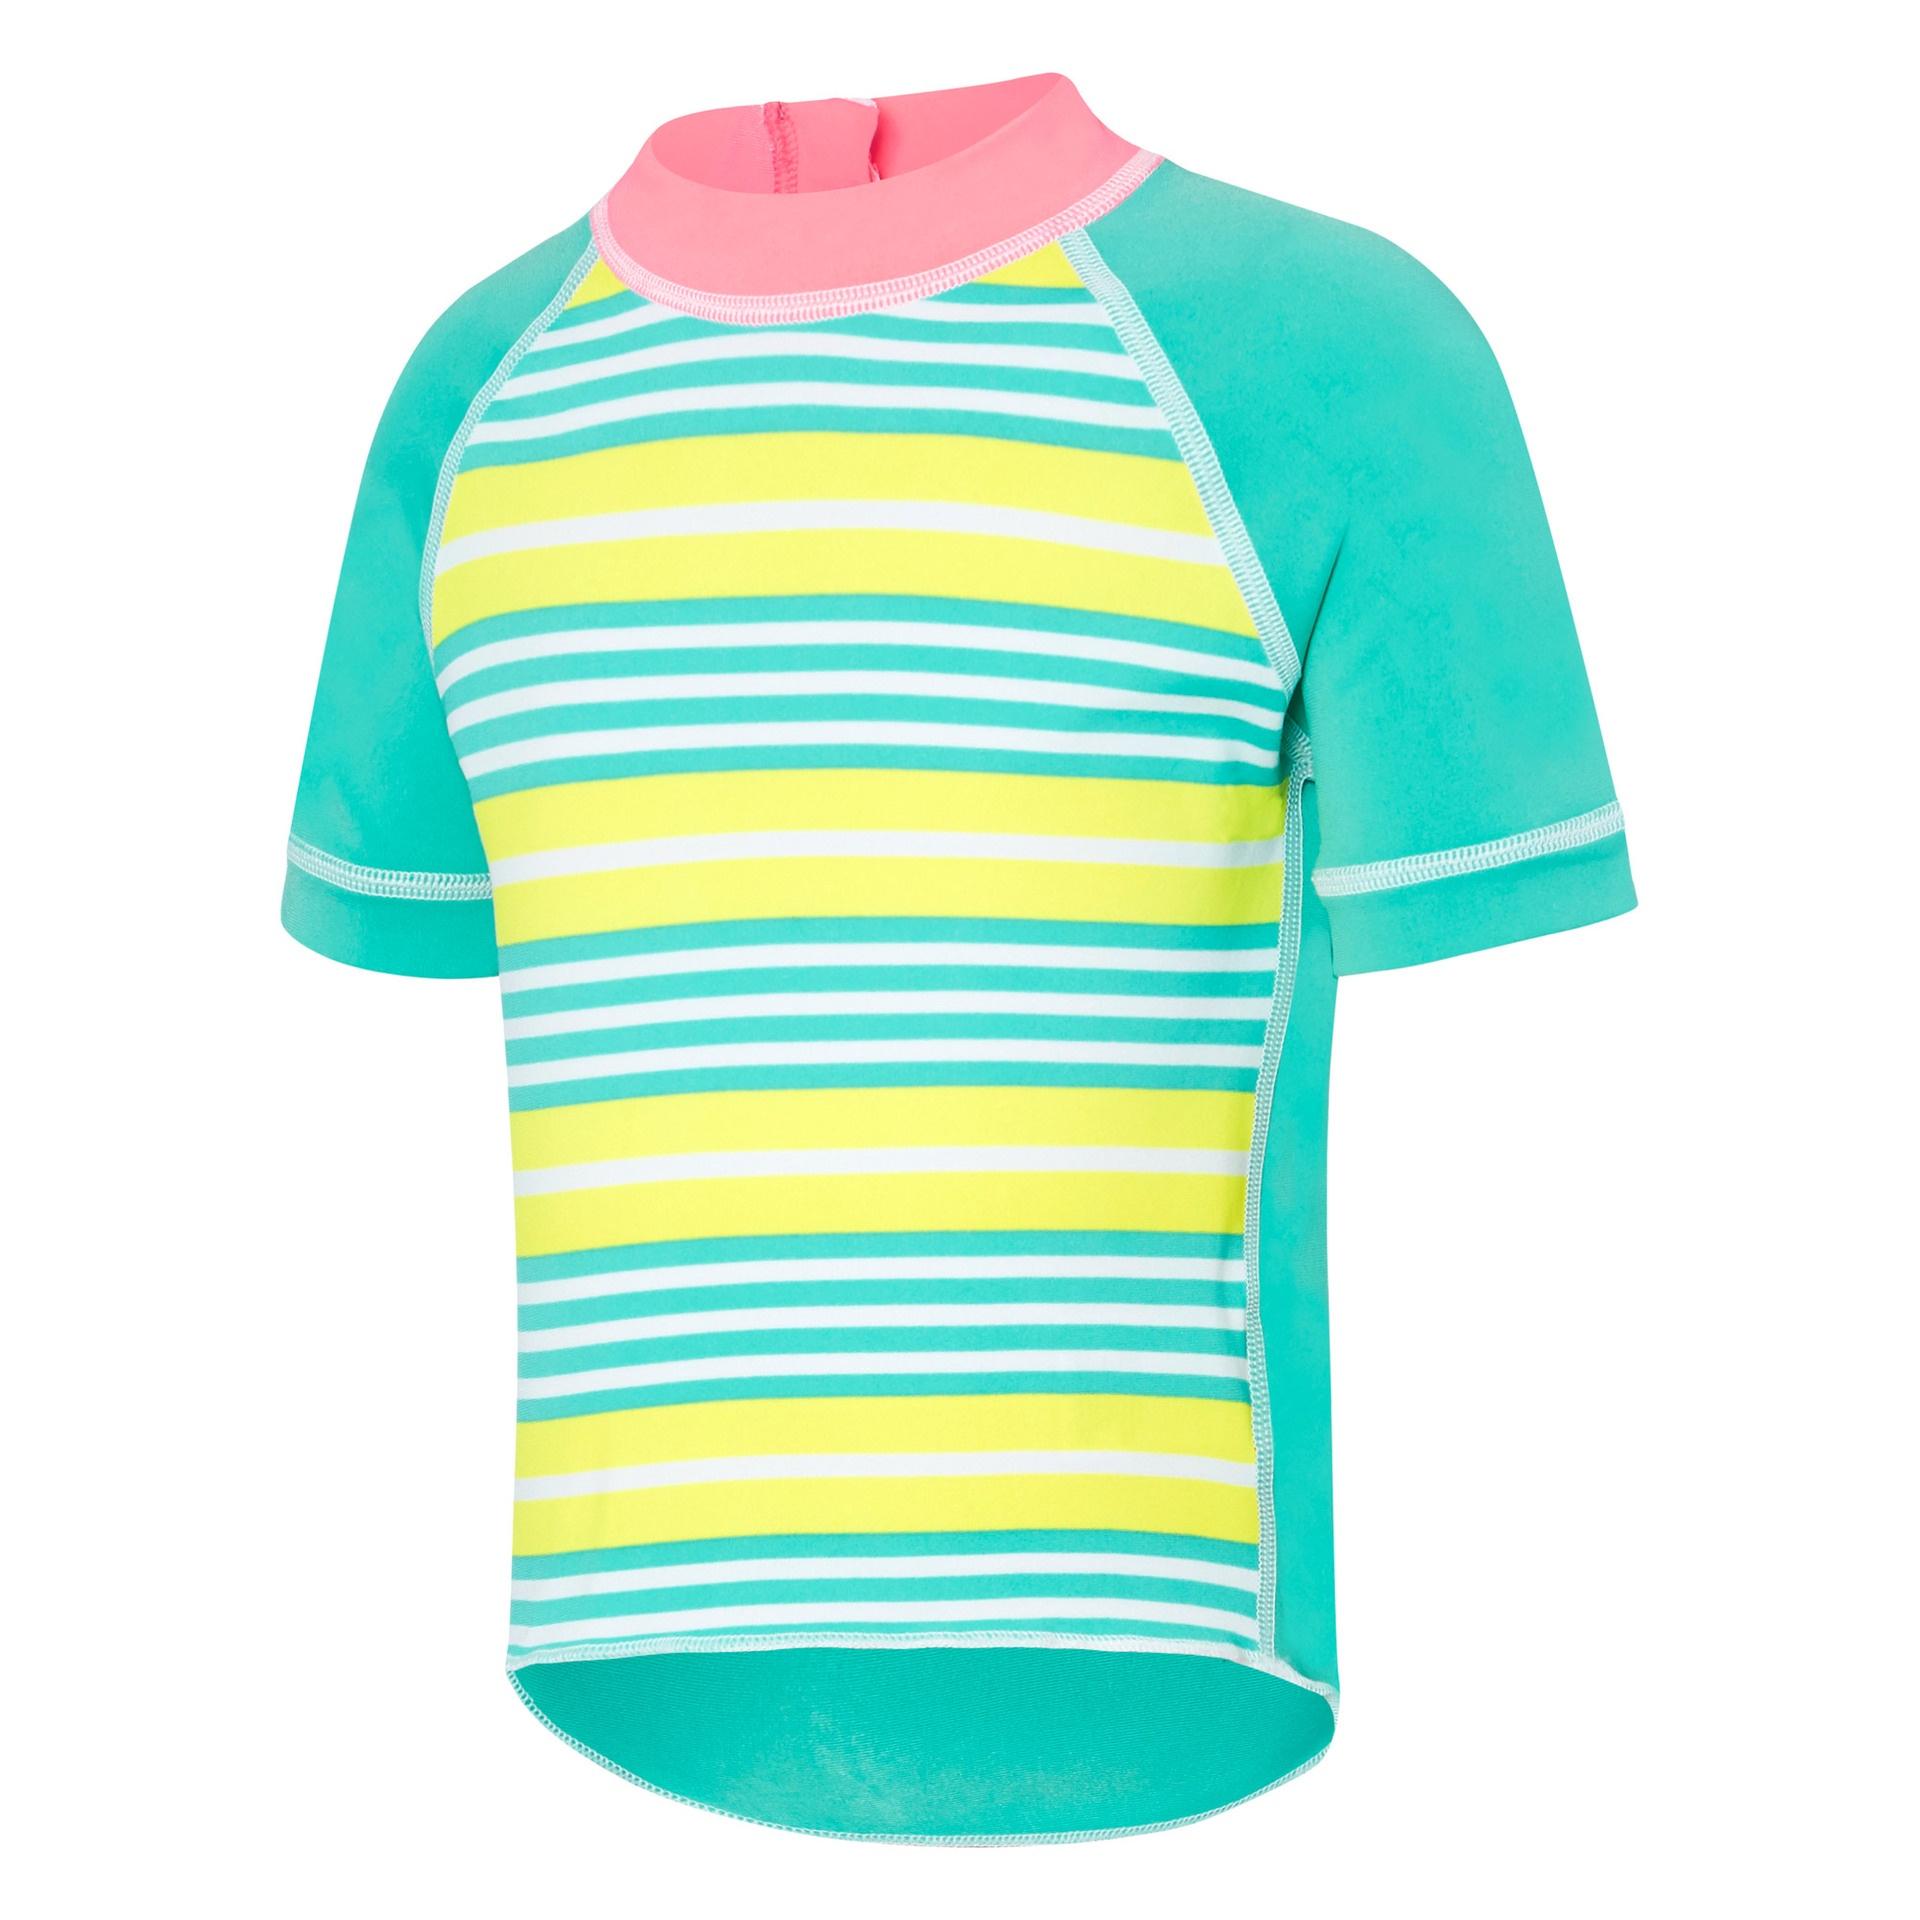 Toddler Girls Short Sleeve Sun Top Stripey/Bali Blue